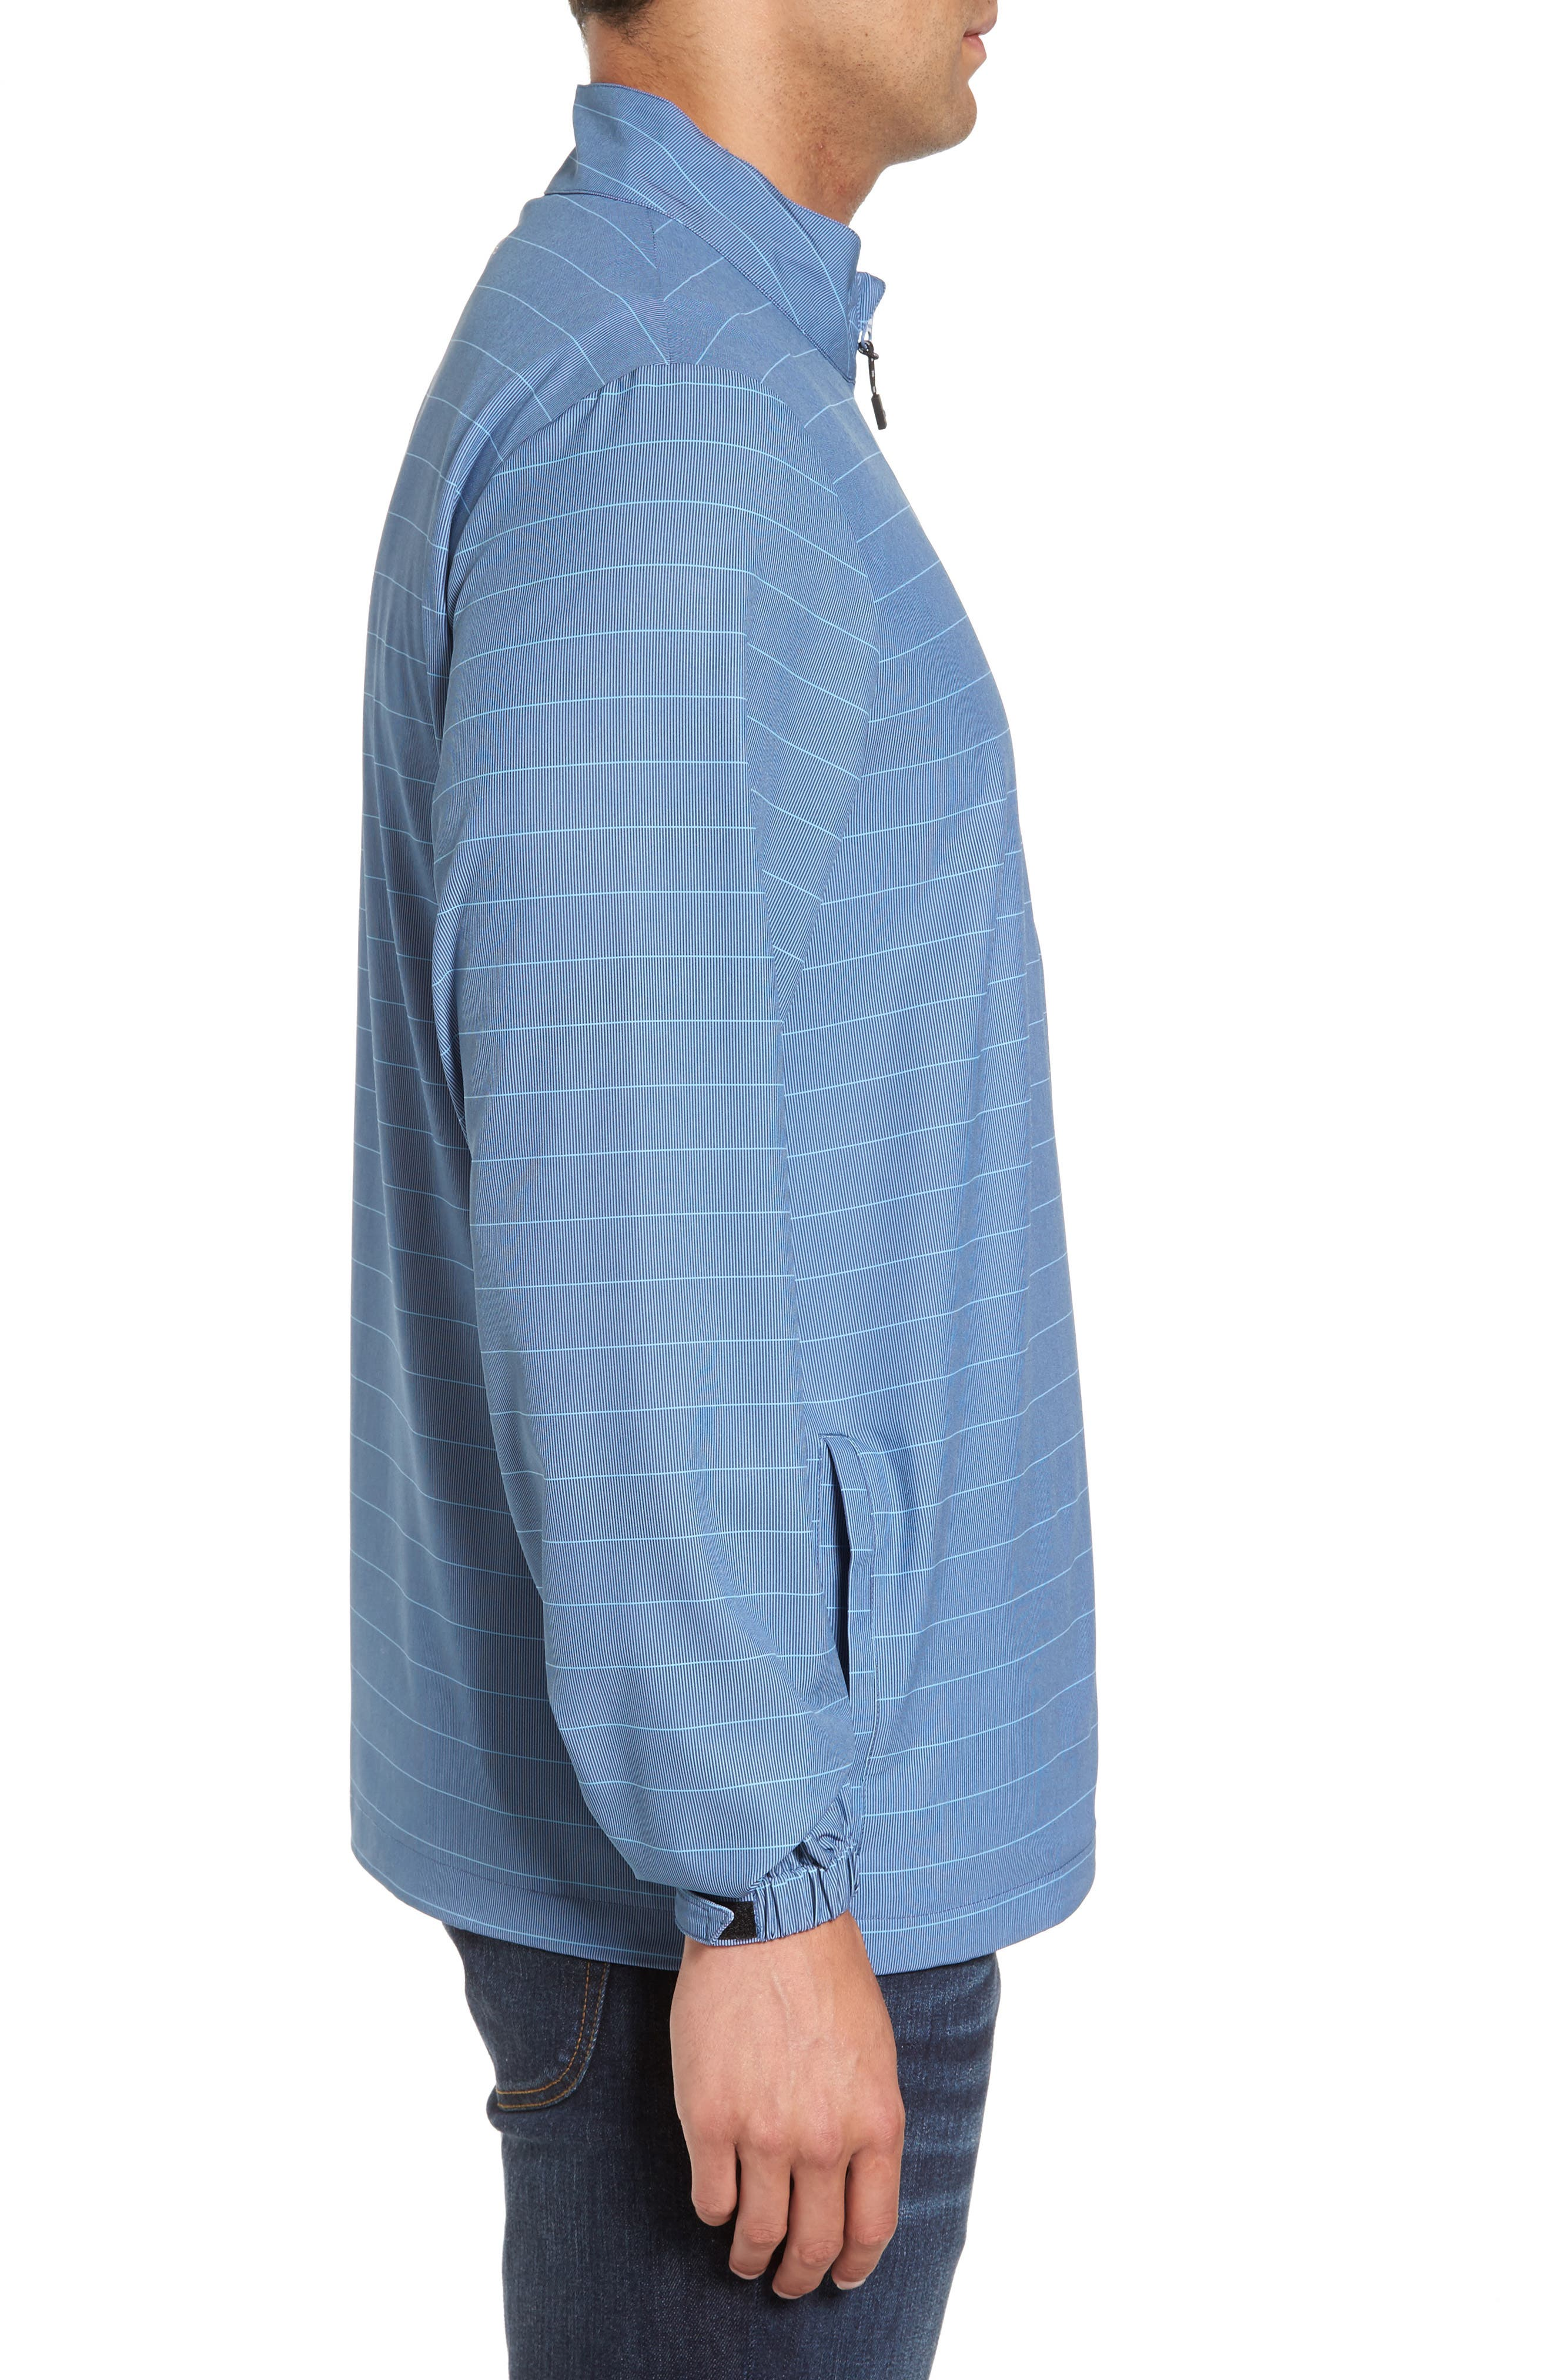 Dubes Quarter Zip Pullover Jacket,                             Alternate thumbnail 3, color,                             Blue Indigo